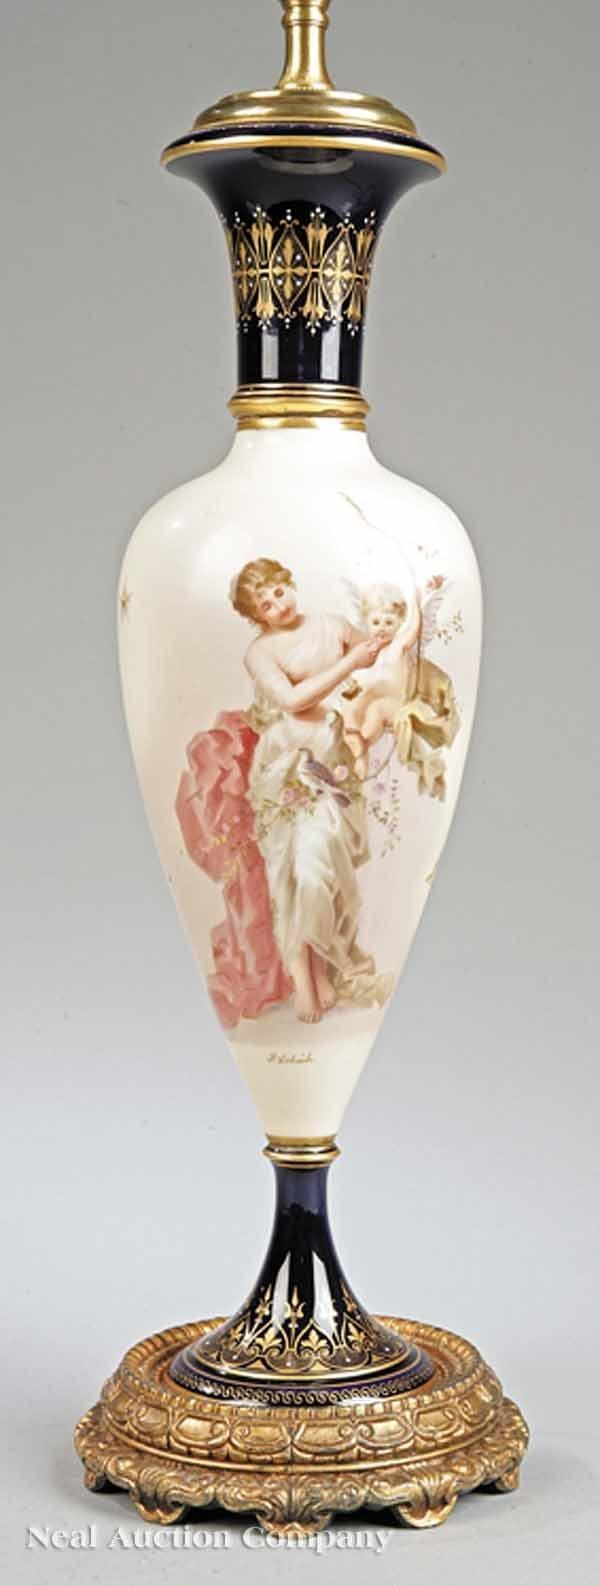 1111: A German Porcelain Vase Depicting Venus and Cupid